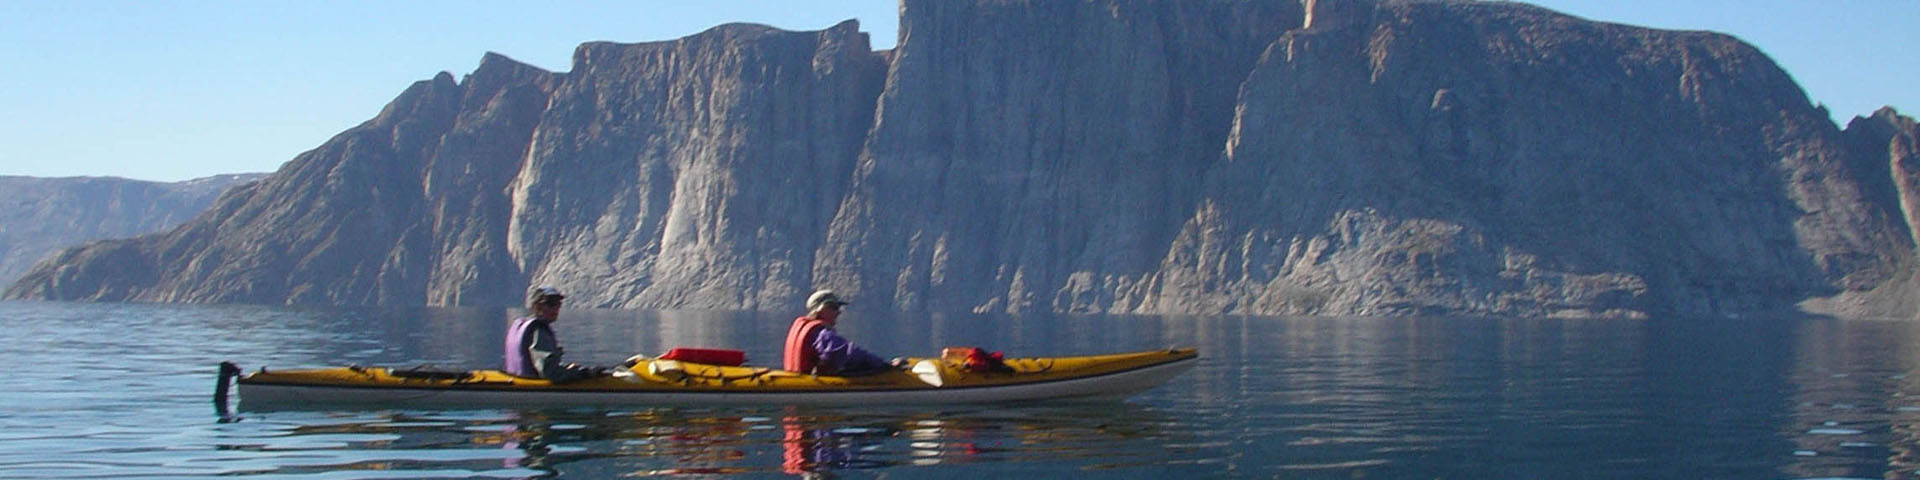 Pond Inlet Sea Kayaking Trip by Black Feather - Image 307